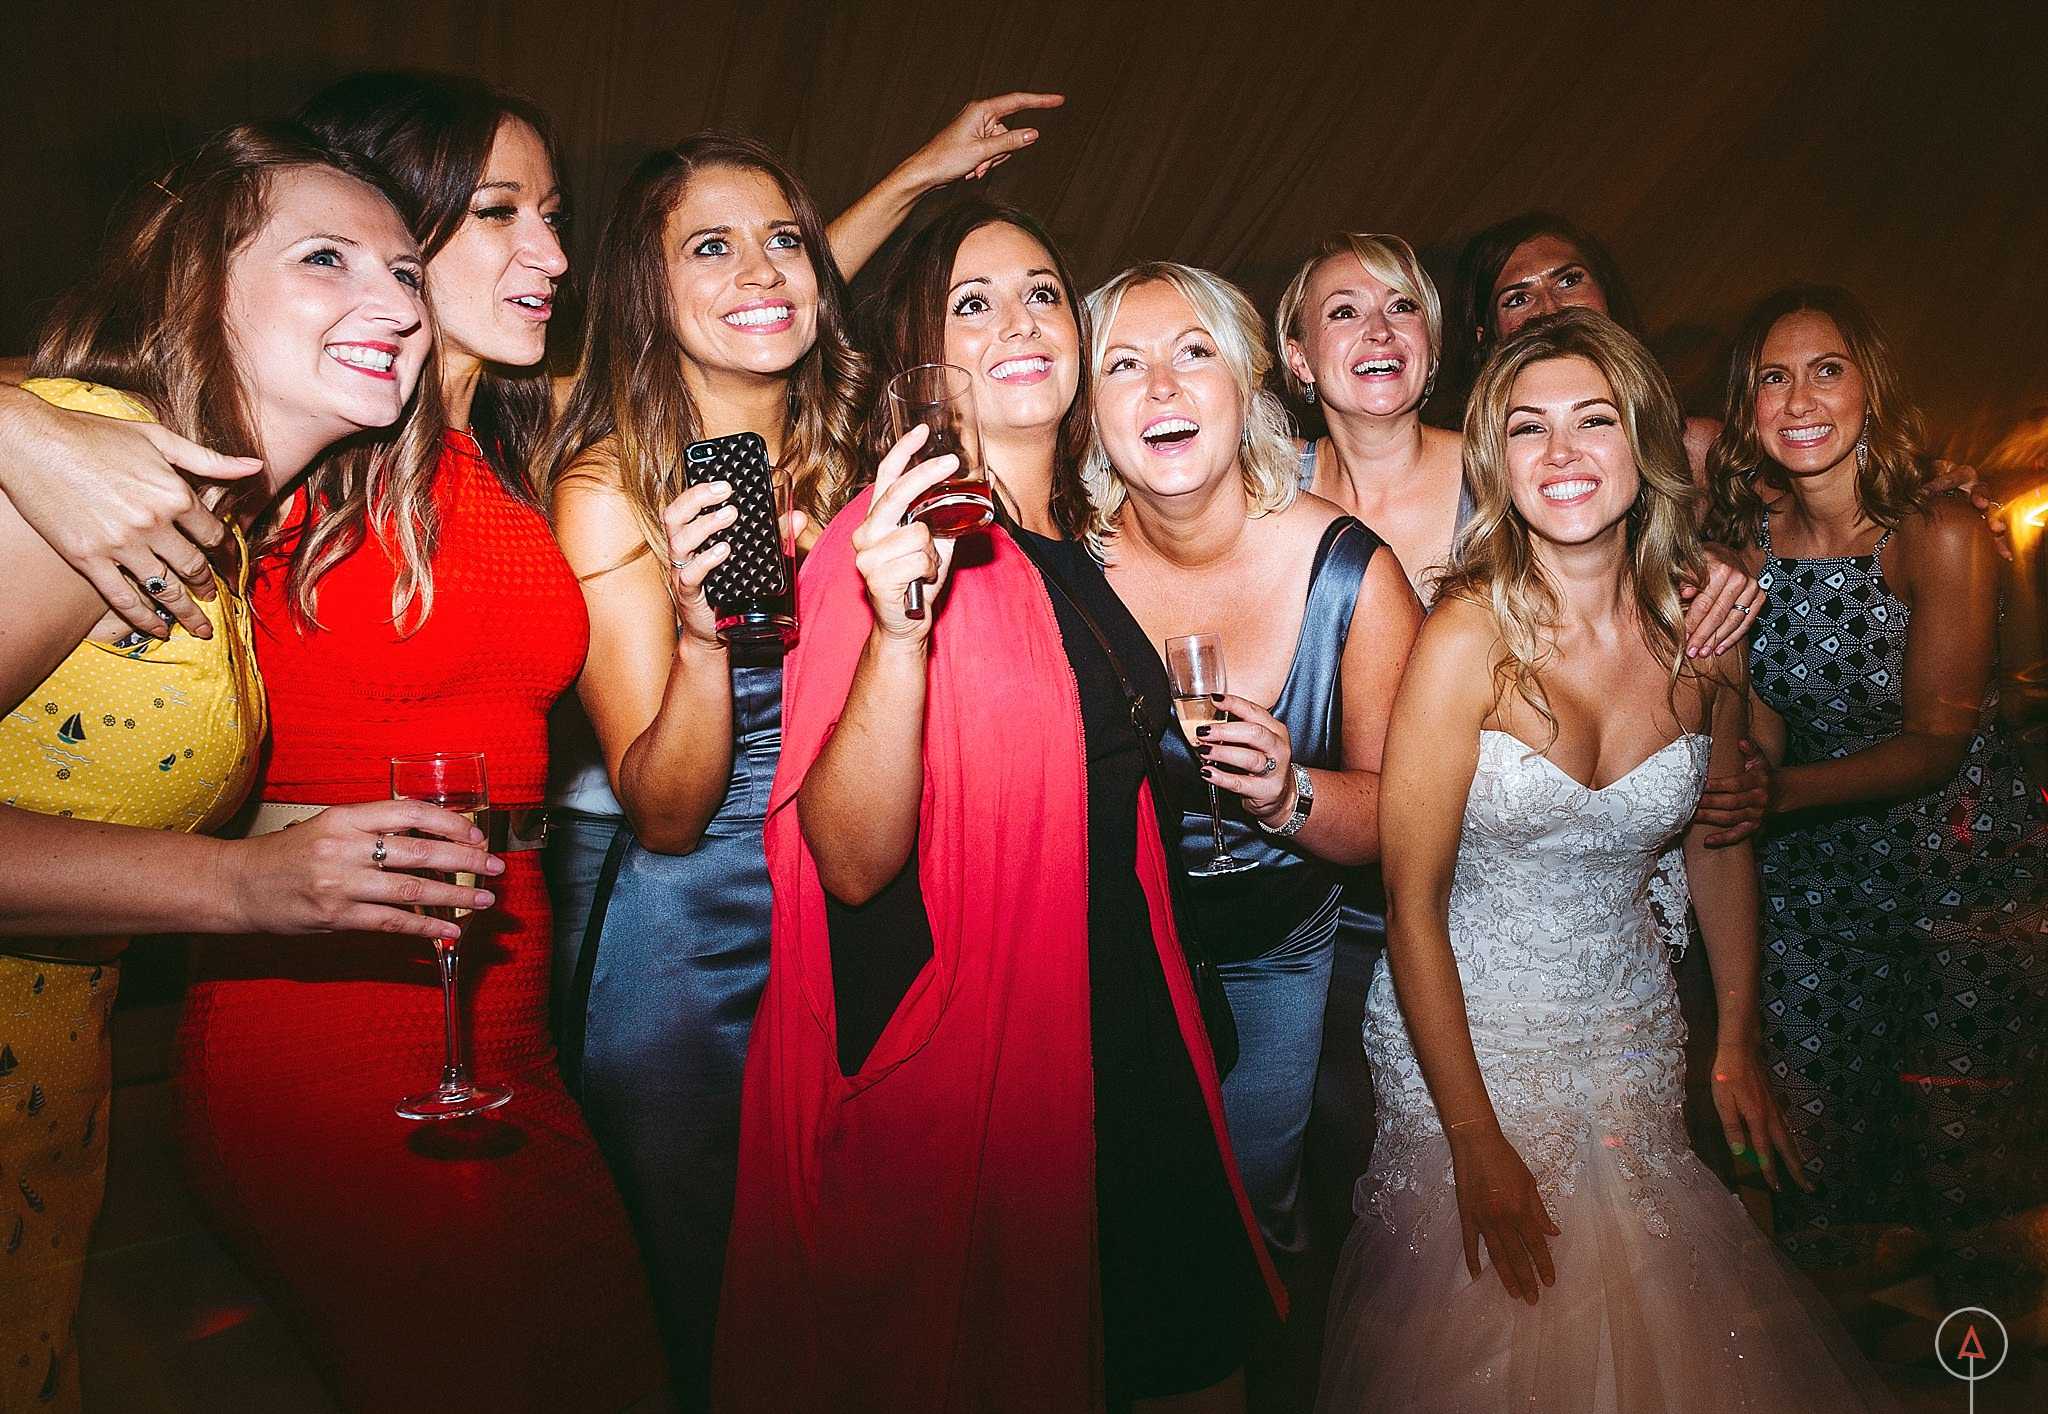 cardiff-wedding-photographer-aga-tomaszek_0415